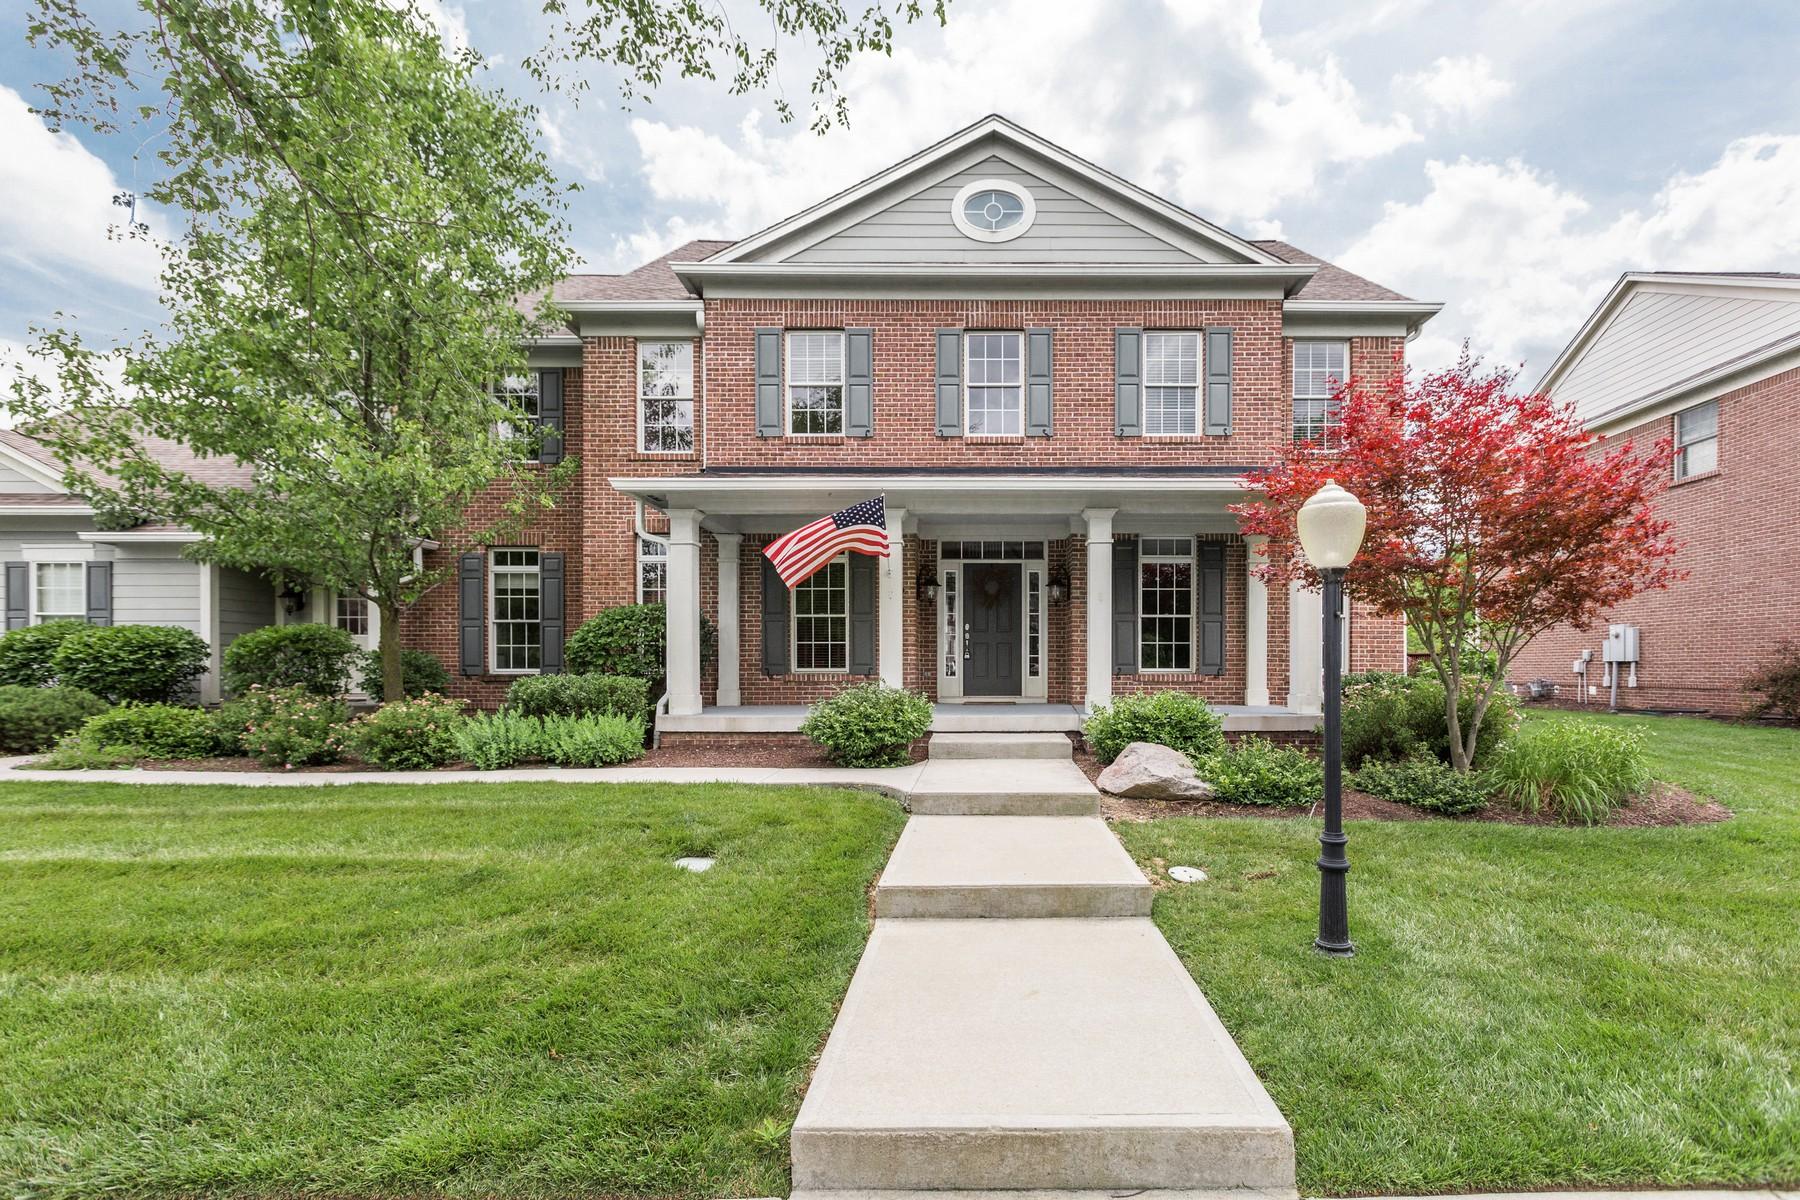 Moradia para Venda às Immaculate Village of WestClay Home 1751 Halifax Street Carmel, Indiana, 46032 Estados Unidos